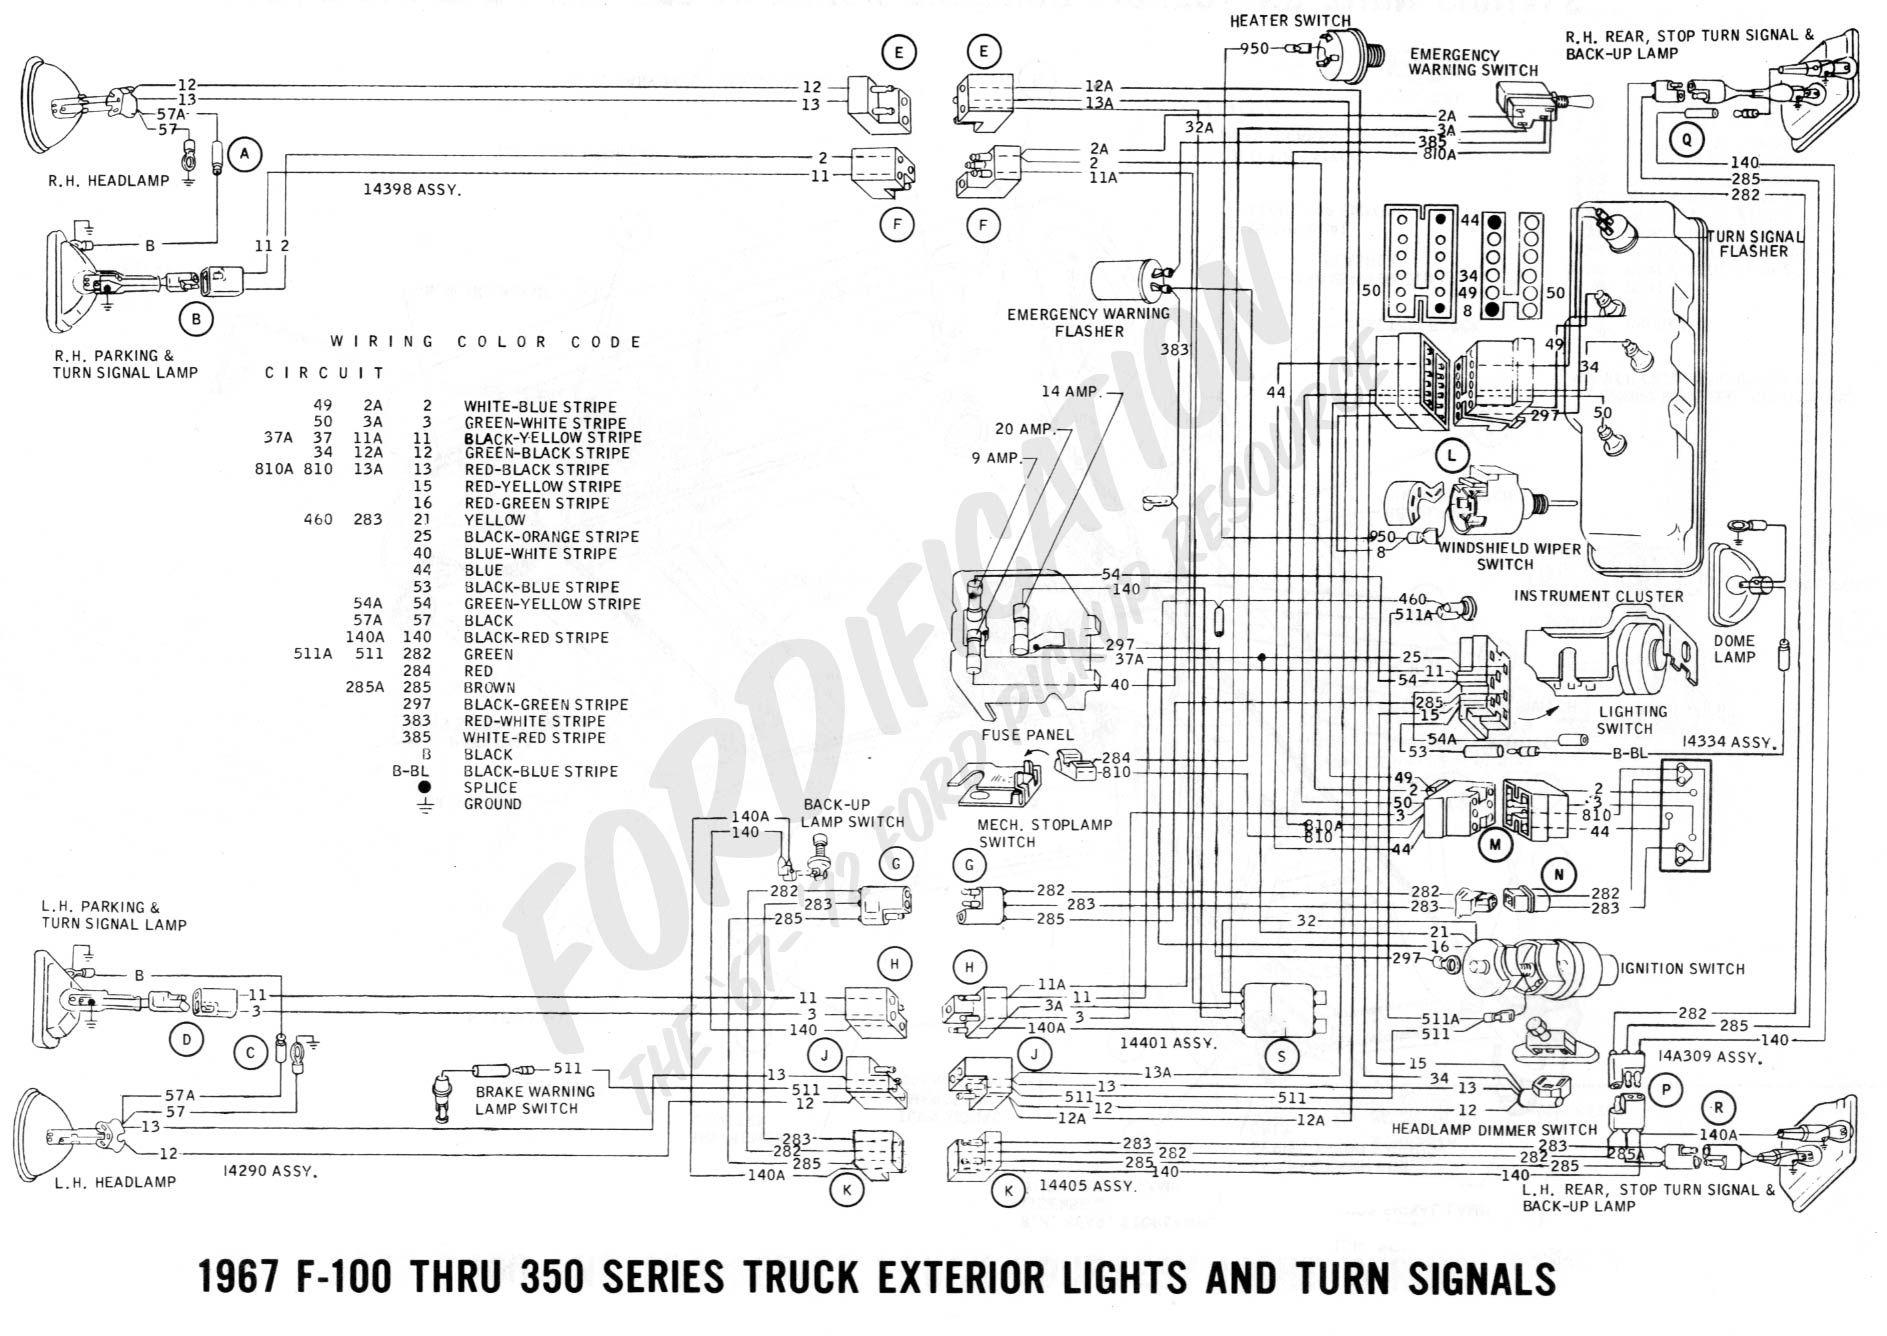 Schön Ford 2000 Traktor Schaltplan Ideen - Schaltplan Serie Circuit ...